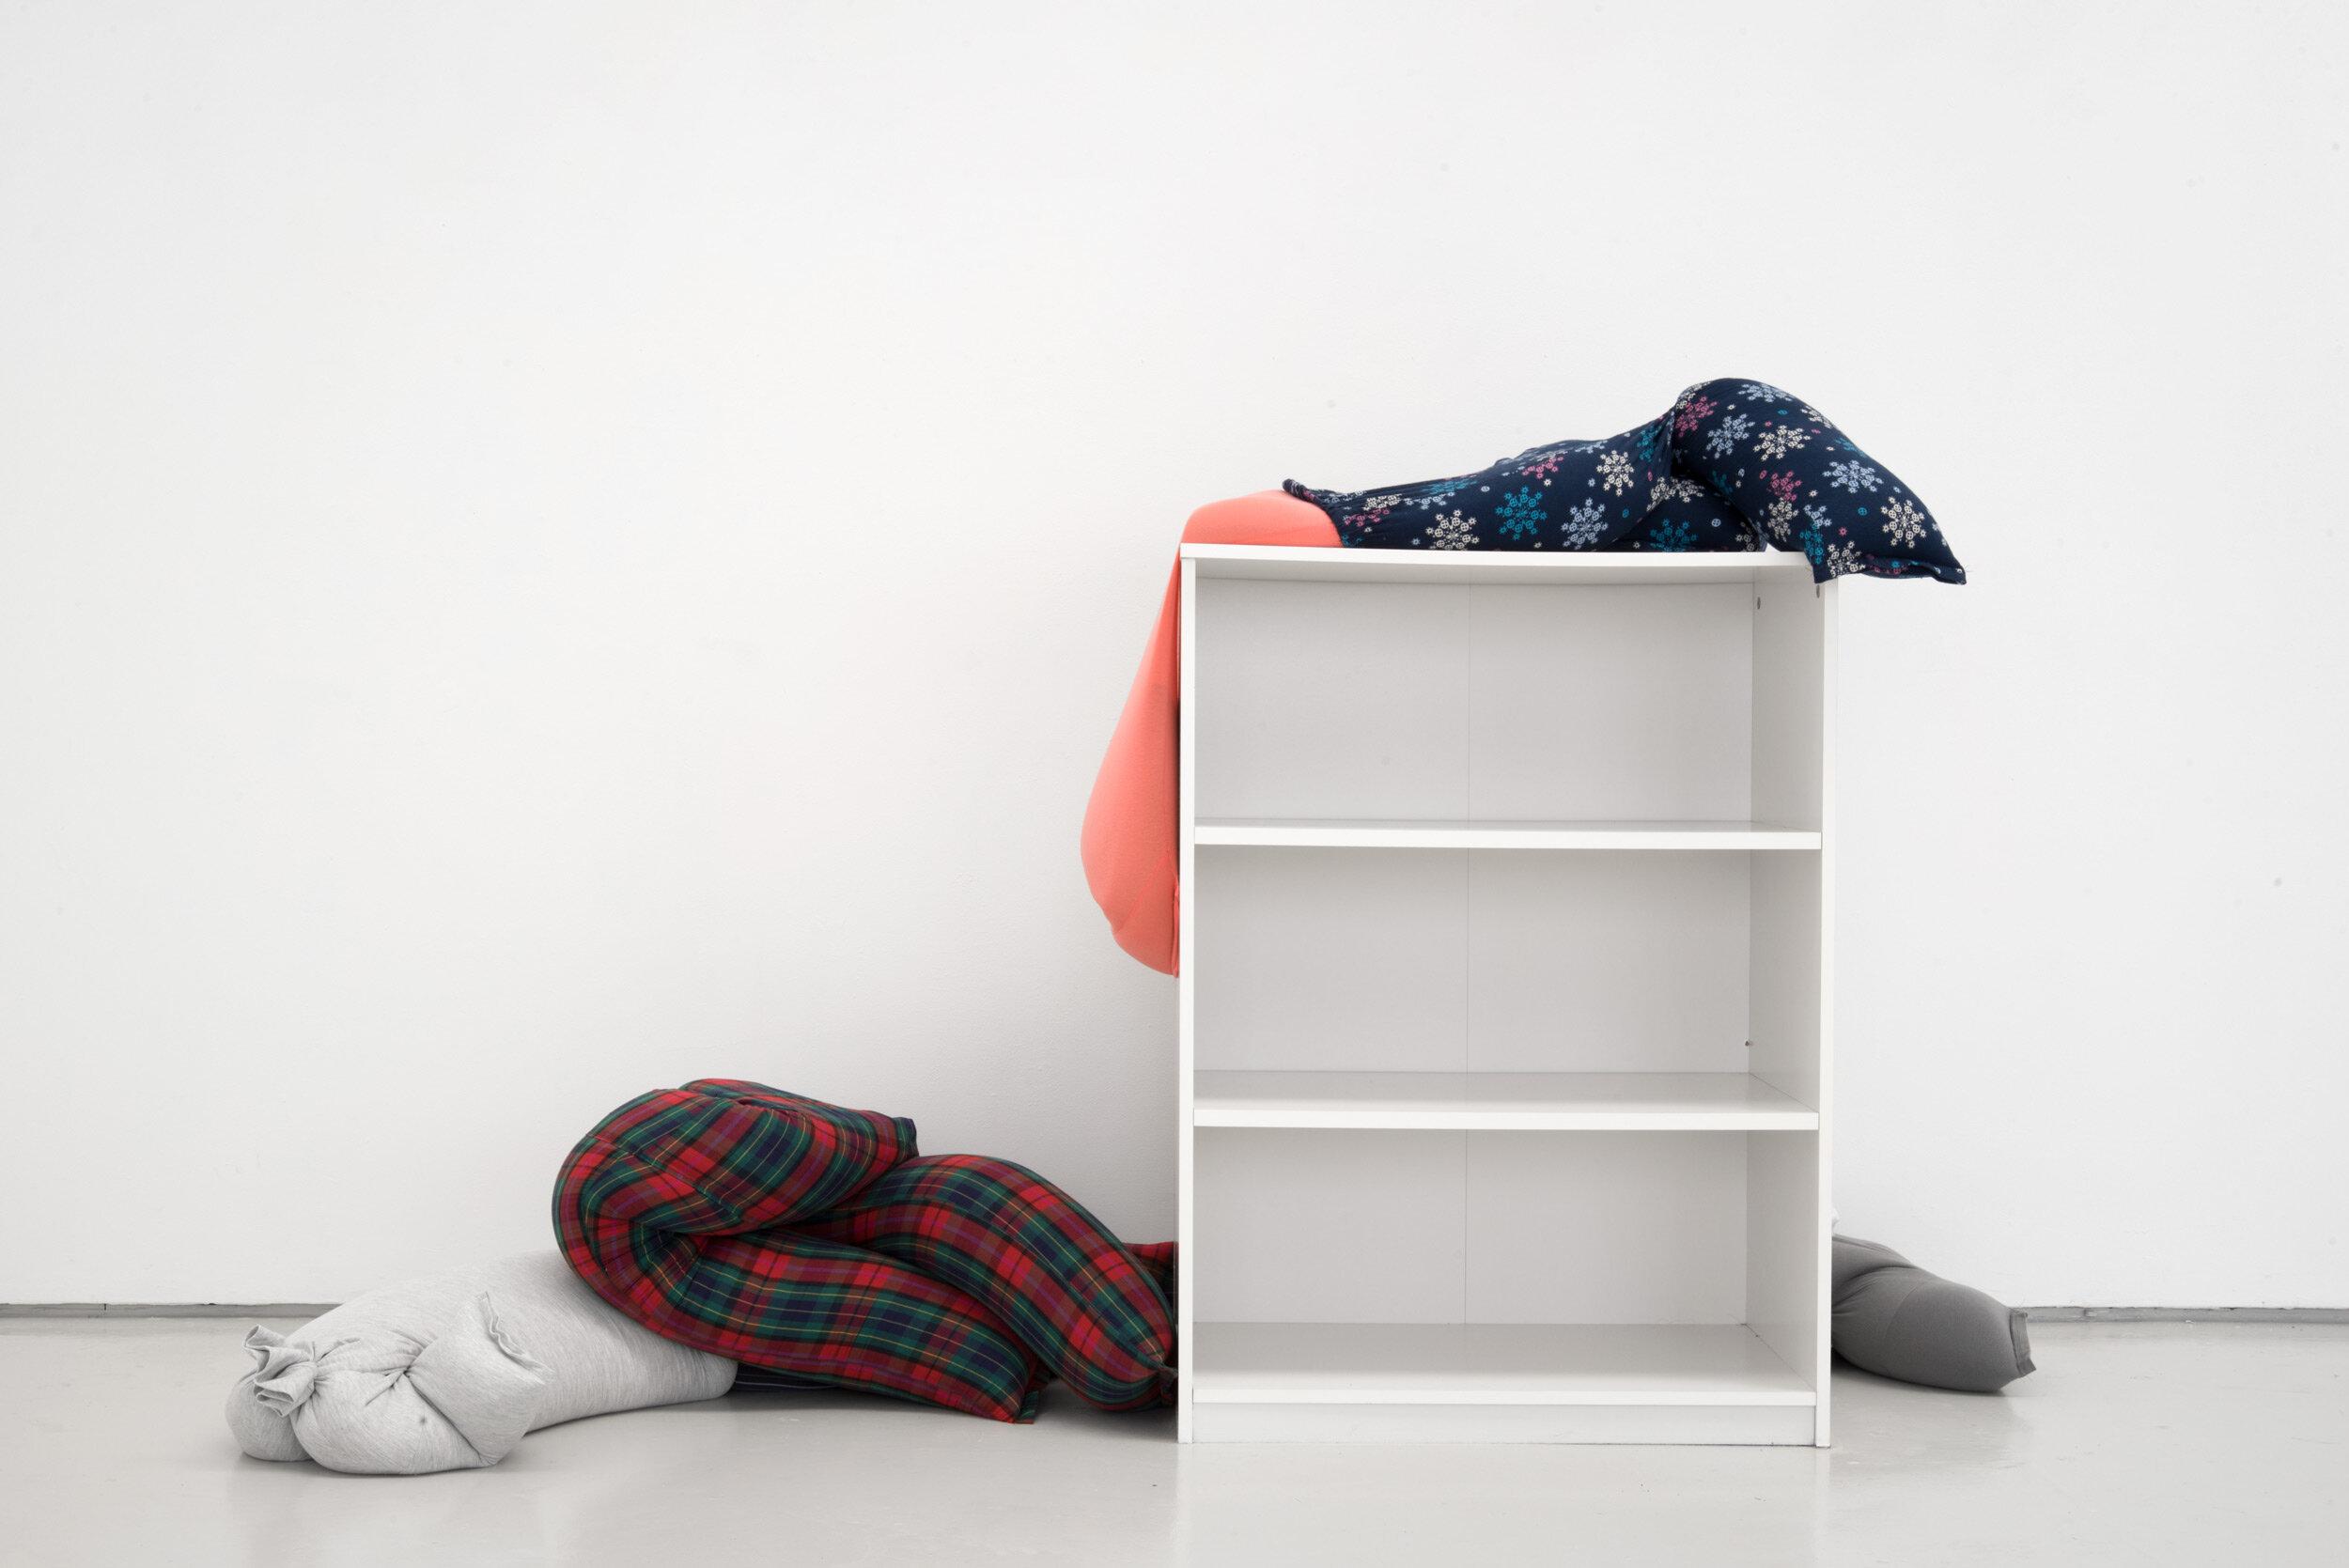 Collapse, slide, bottom-out beside low on a bookshelf, Alex Farrar, Bloc Projects, 2019, 1.jpg